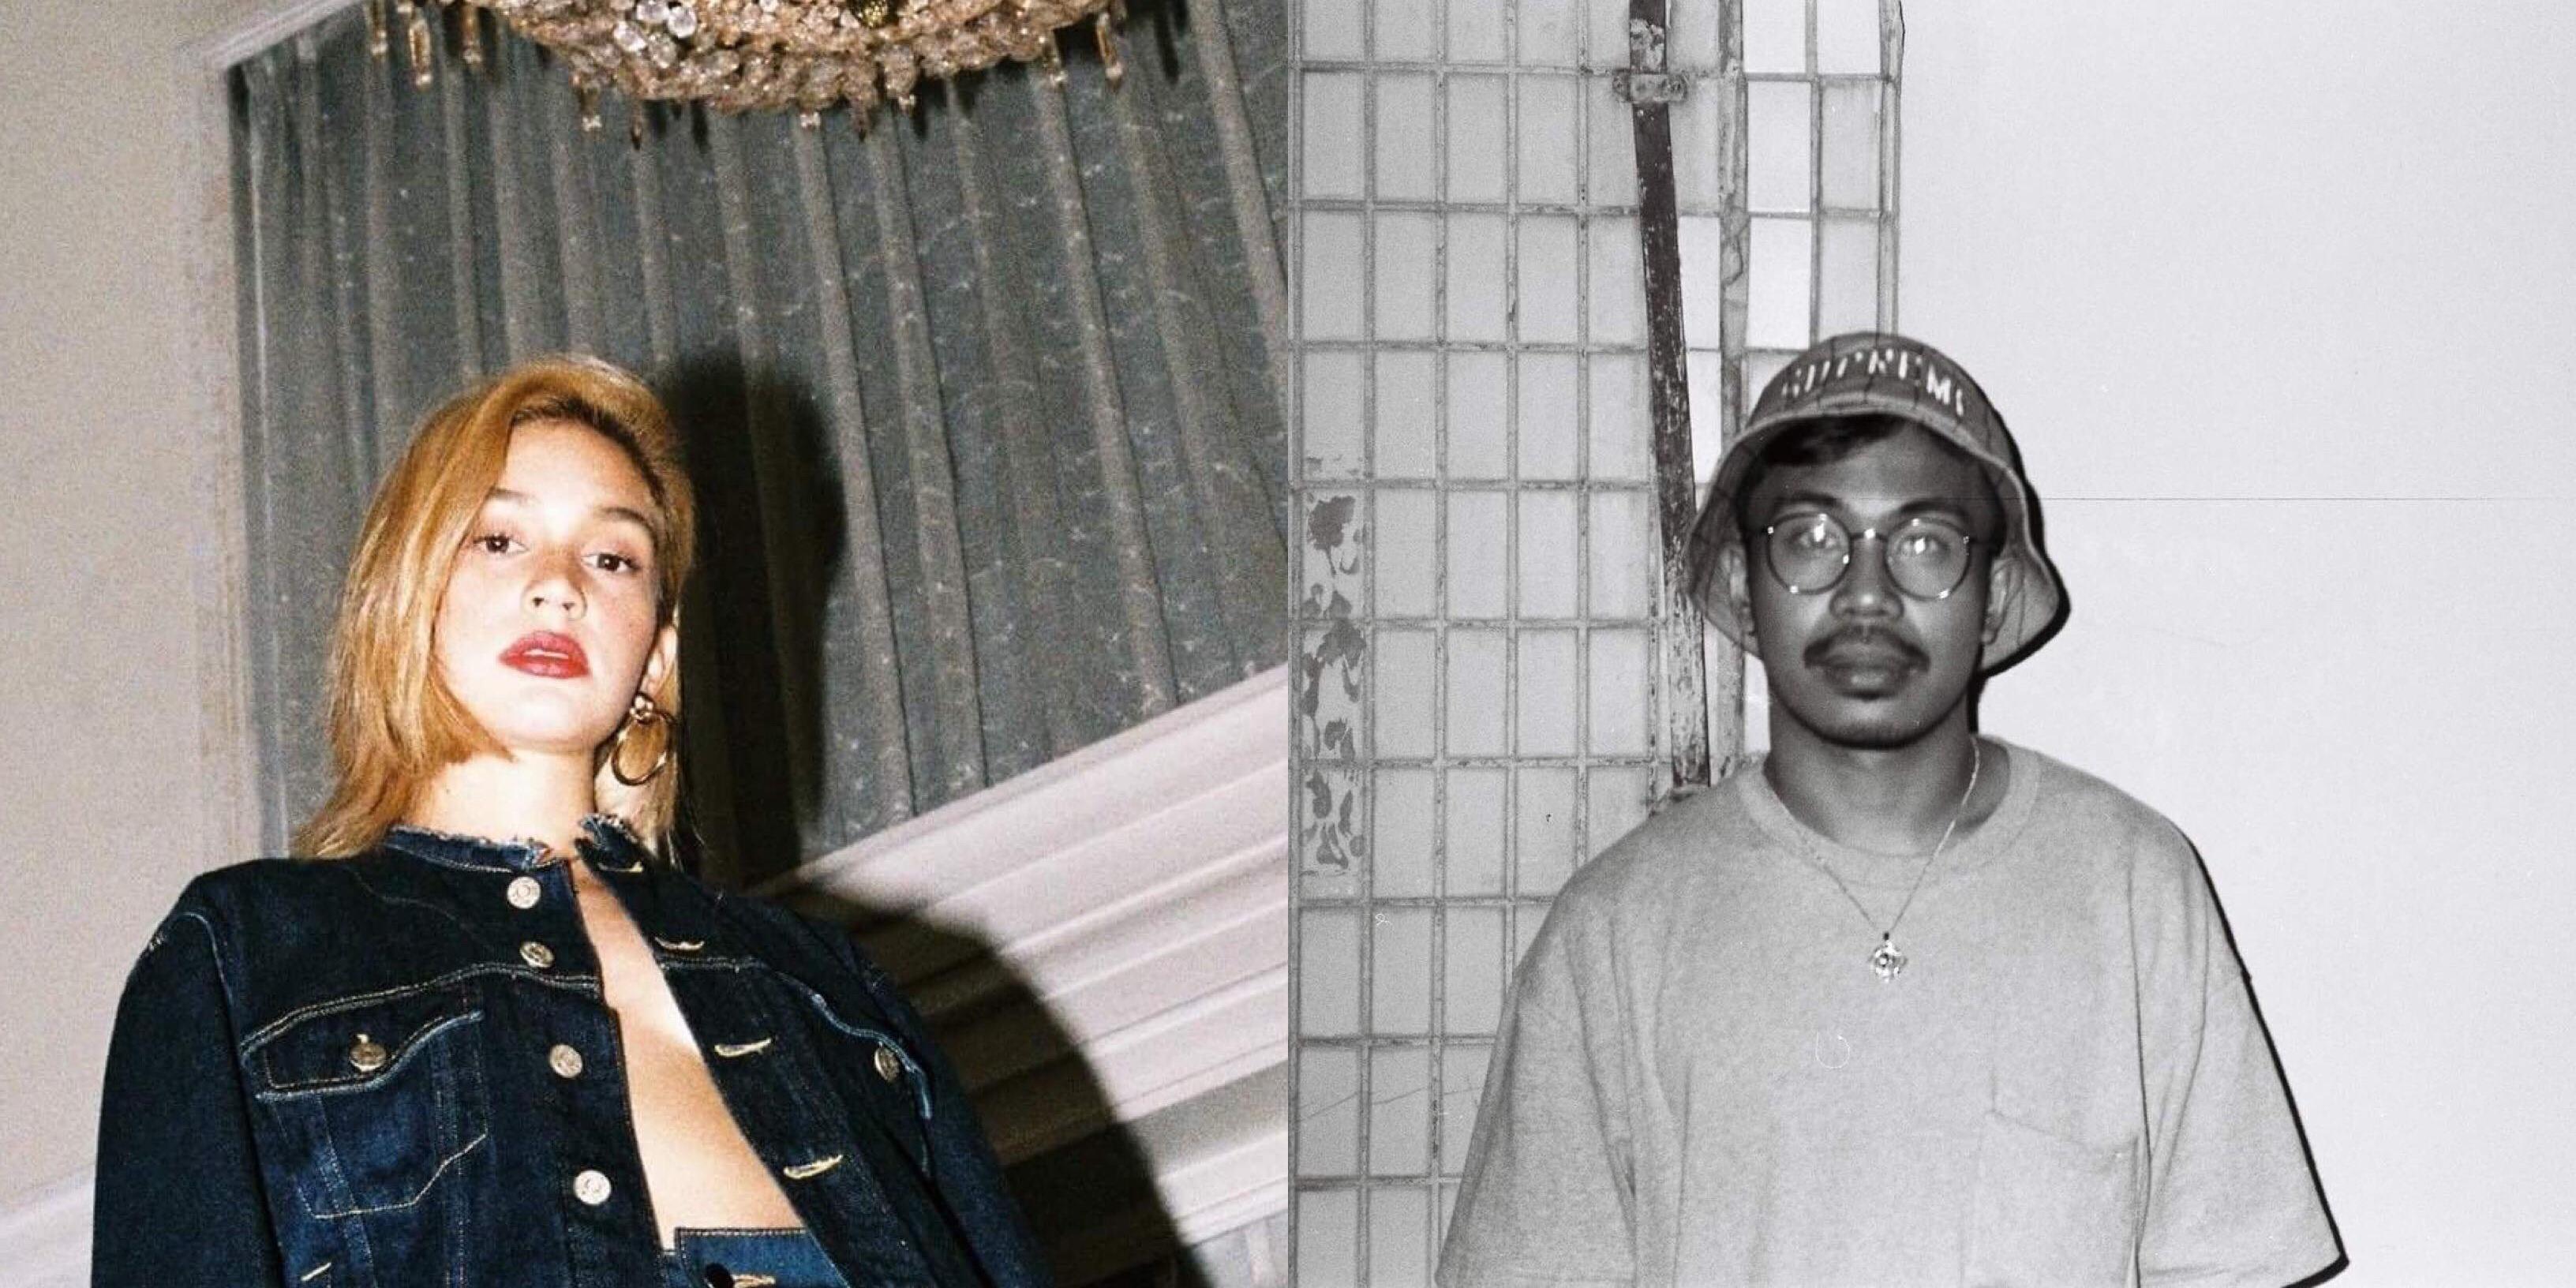 Jess Connelly and CRWN drop Valentine's Day track, 'Mine' – listen